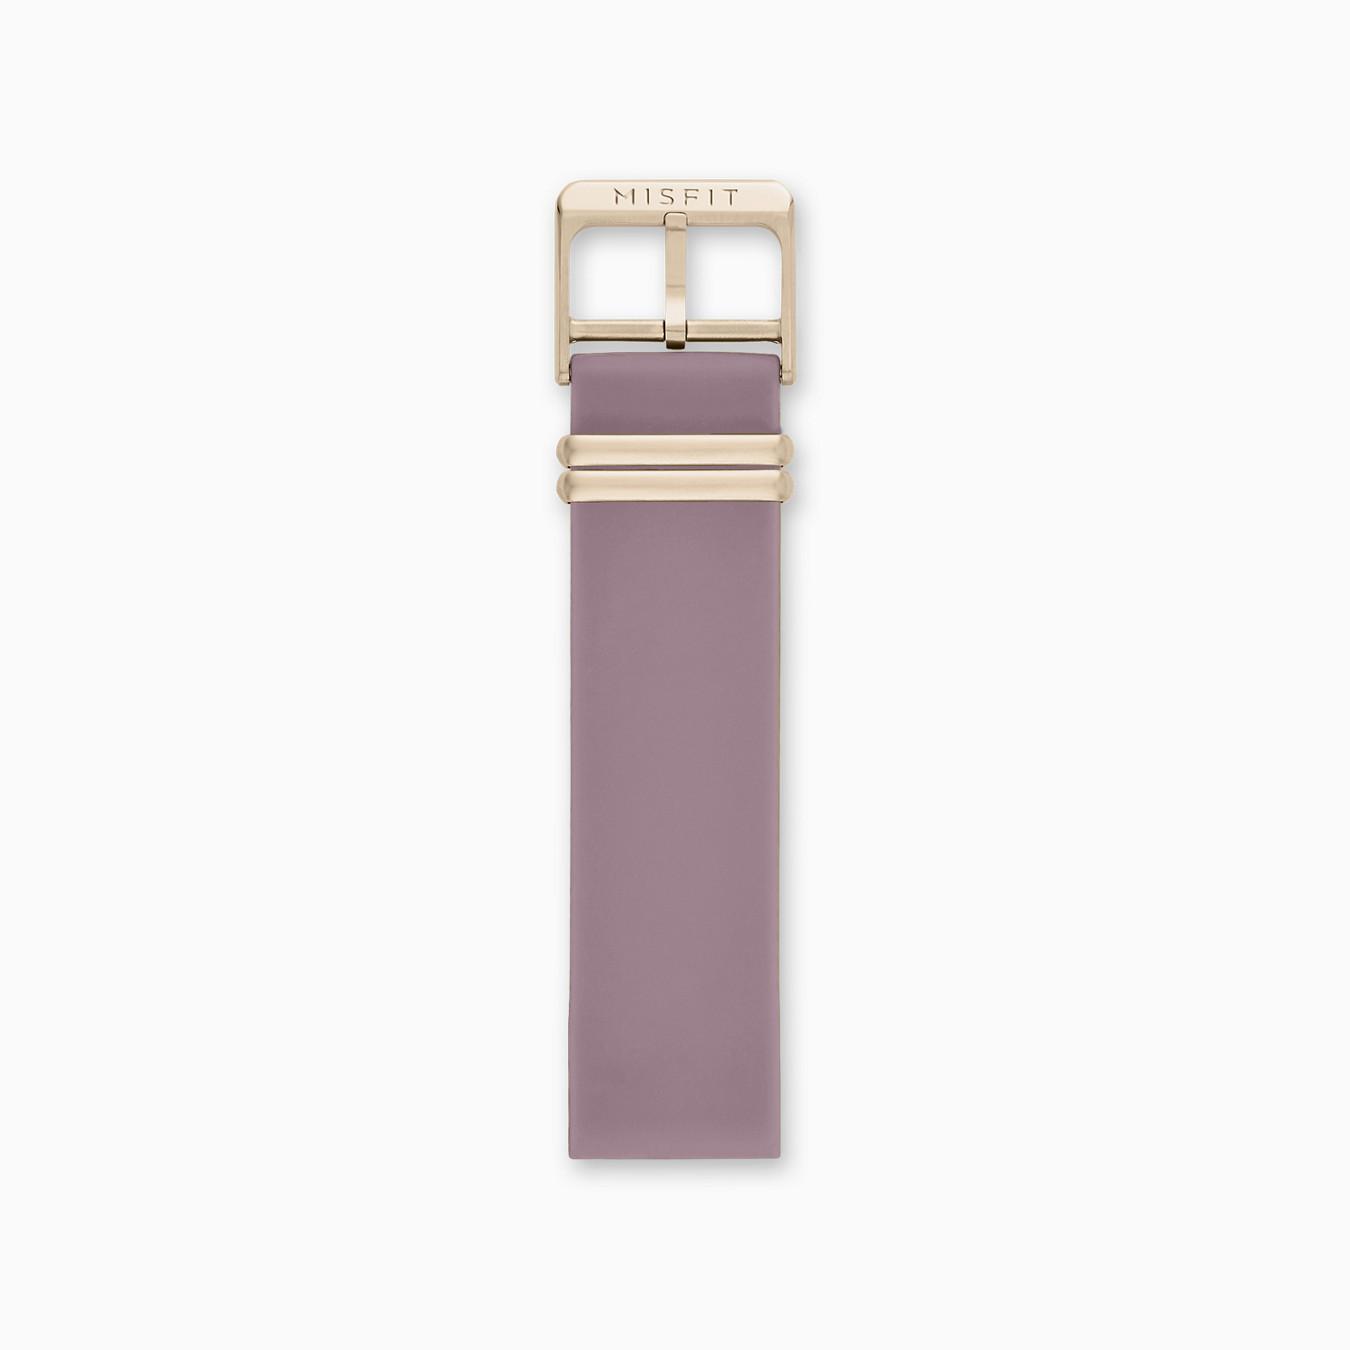 20mm Misfit Smartwatch Sport Strap - Misfit